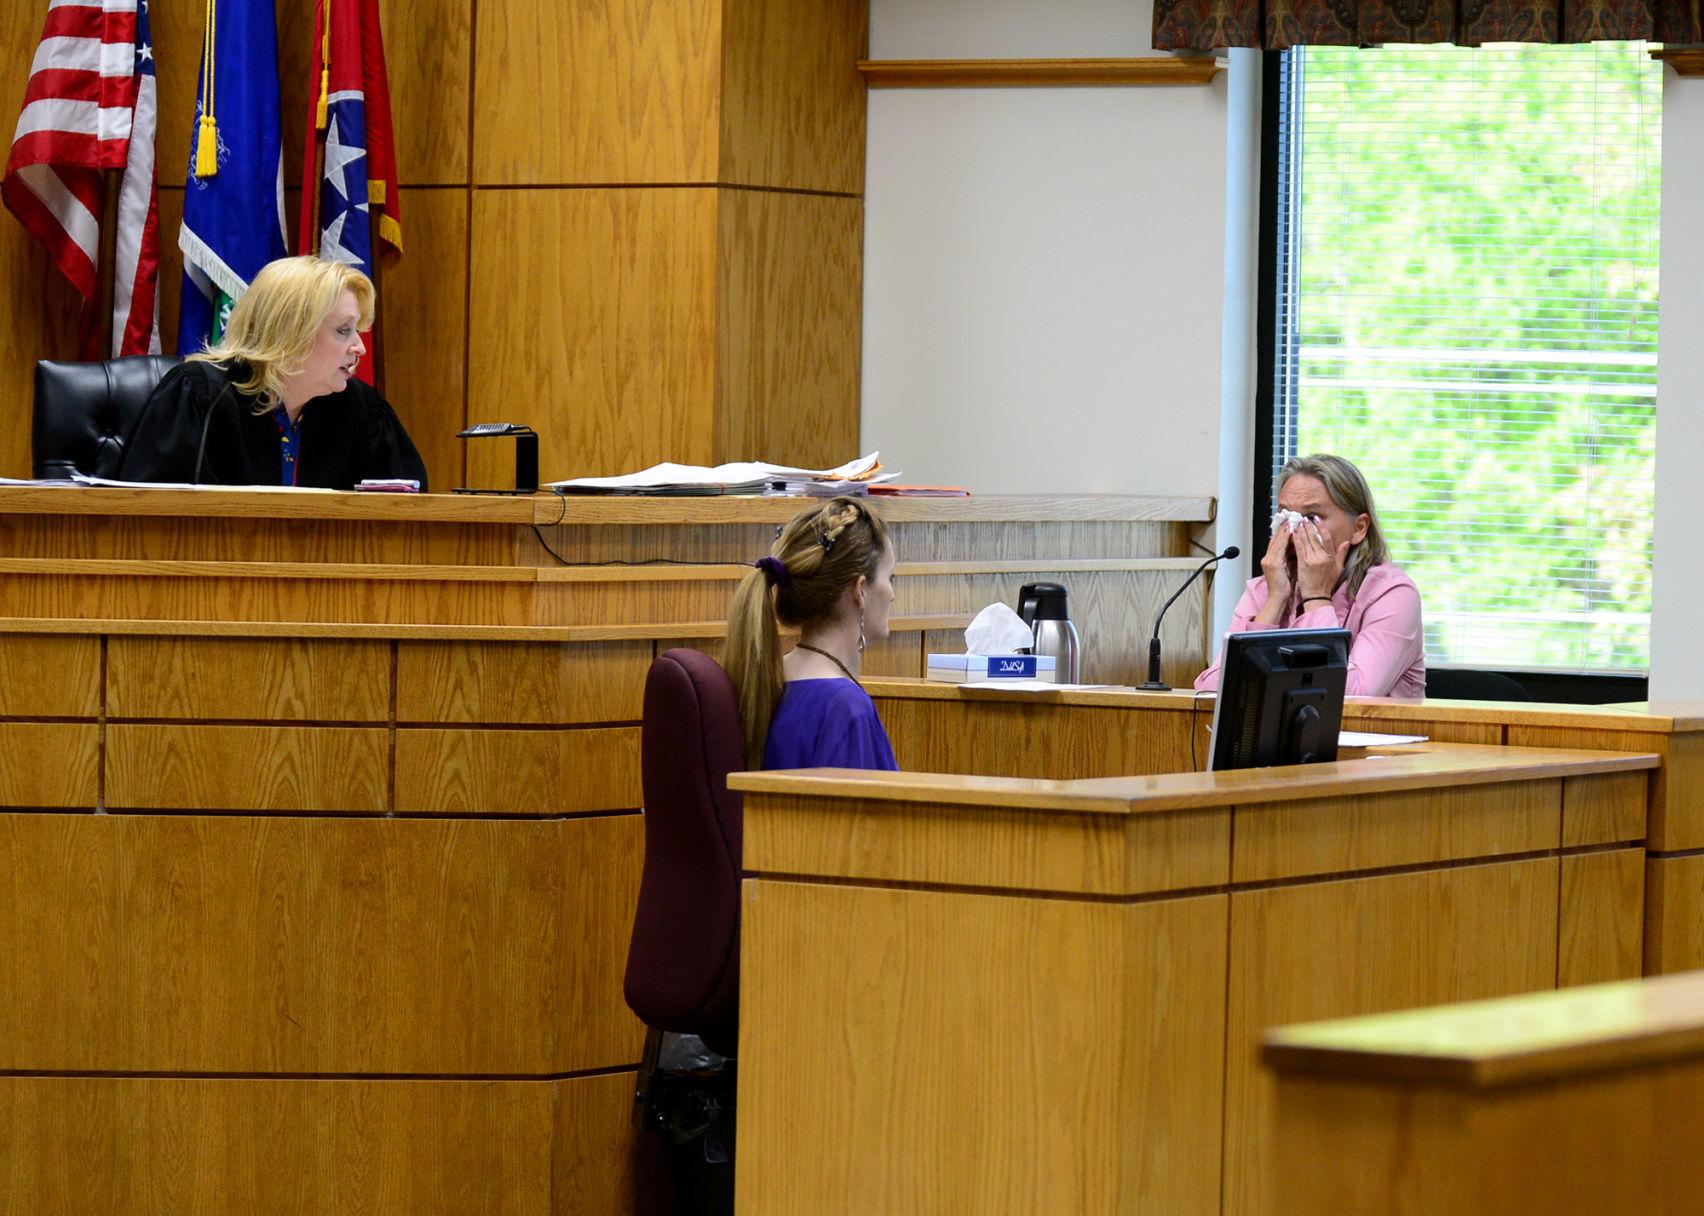 Blount County Circuit Judge Tammy Harrington tells